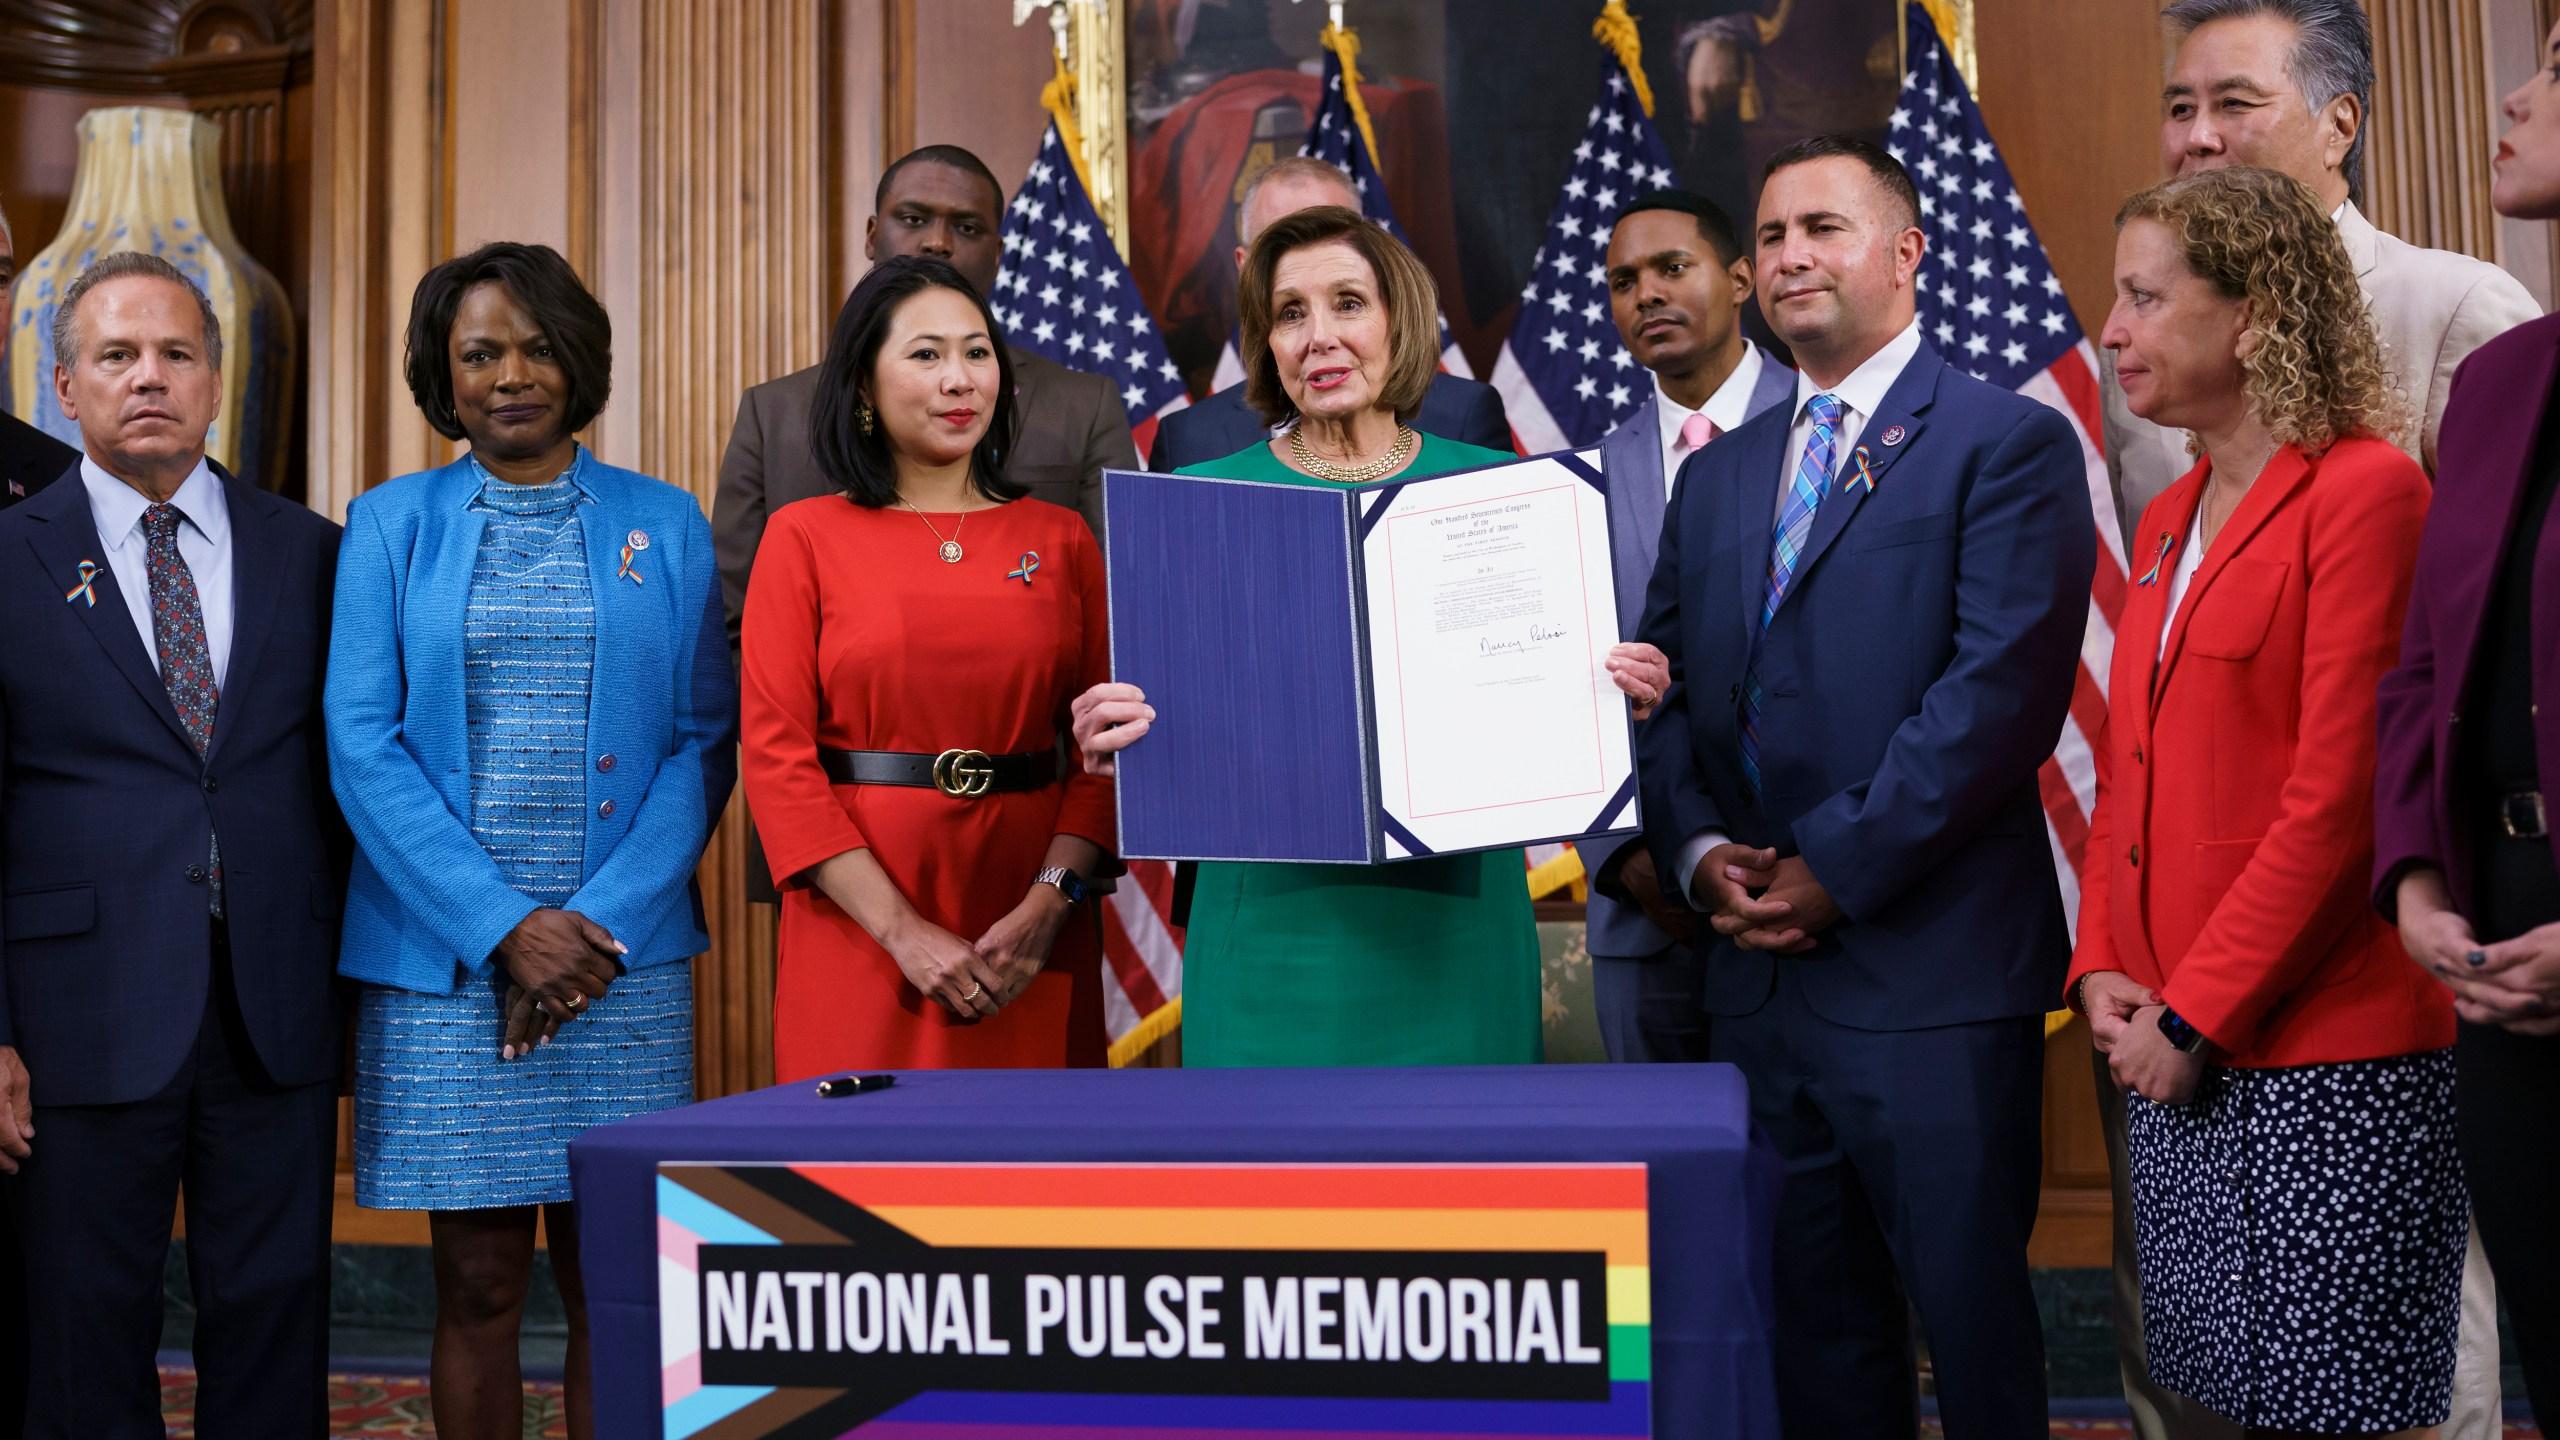 Nancy Pelosi, David Cicilline, Val Demings, Stephanie Murphy, Darren Soto, Debbie Wasserman Schultz